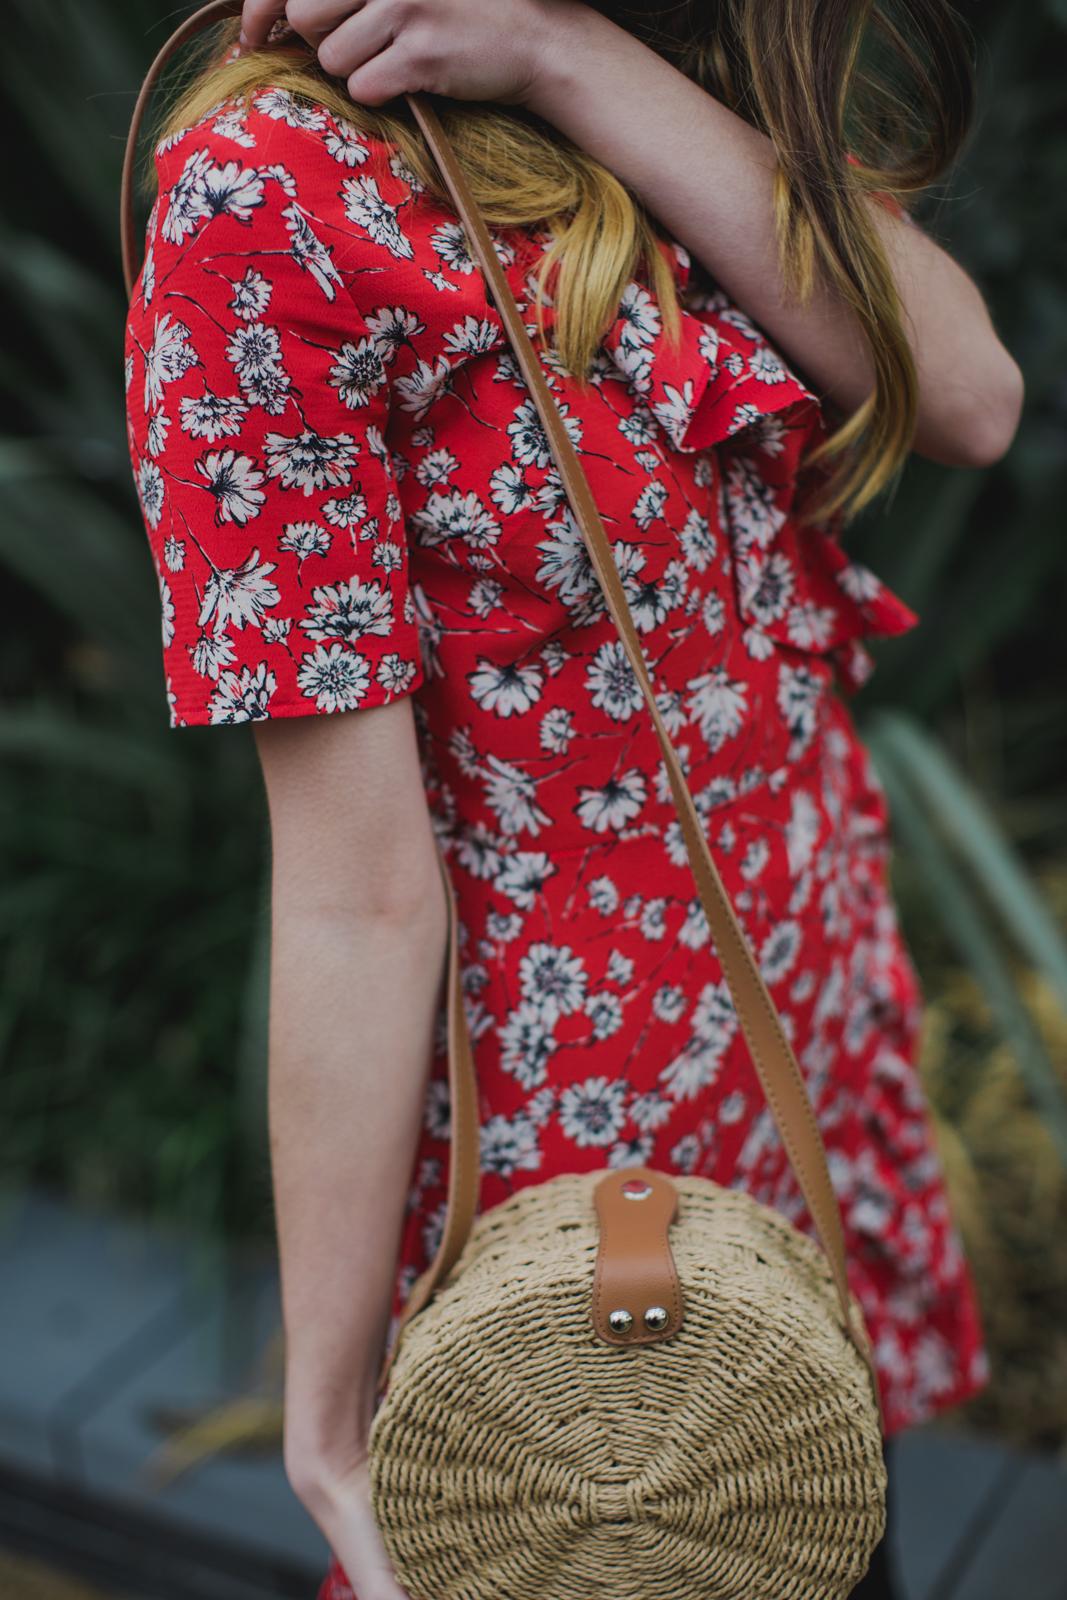 fashion-photographer-london-fashionstory-jasmina-haskovic-minas-planet-uk25.jpg